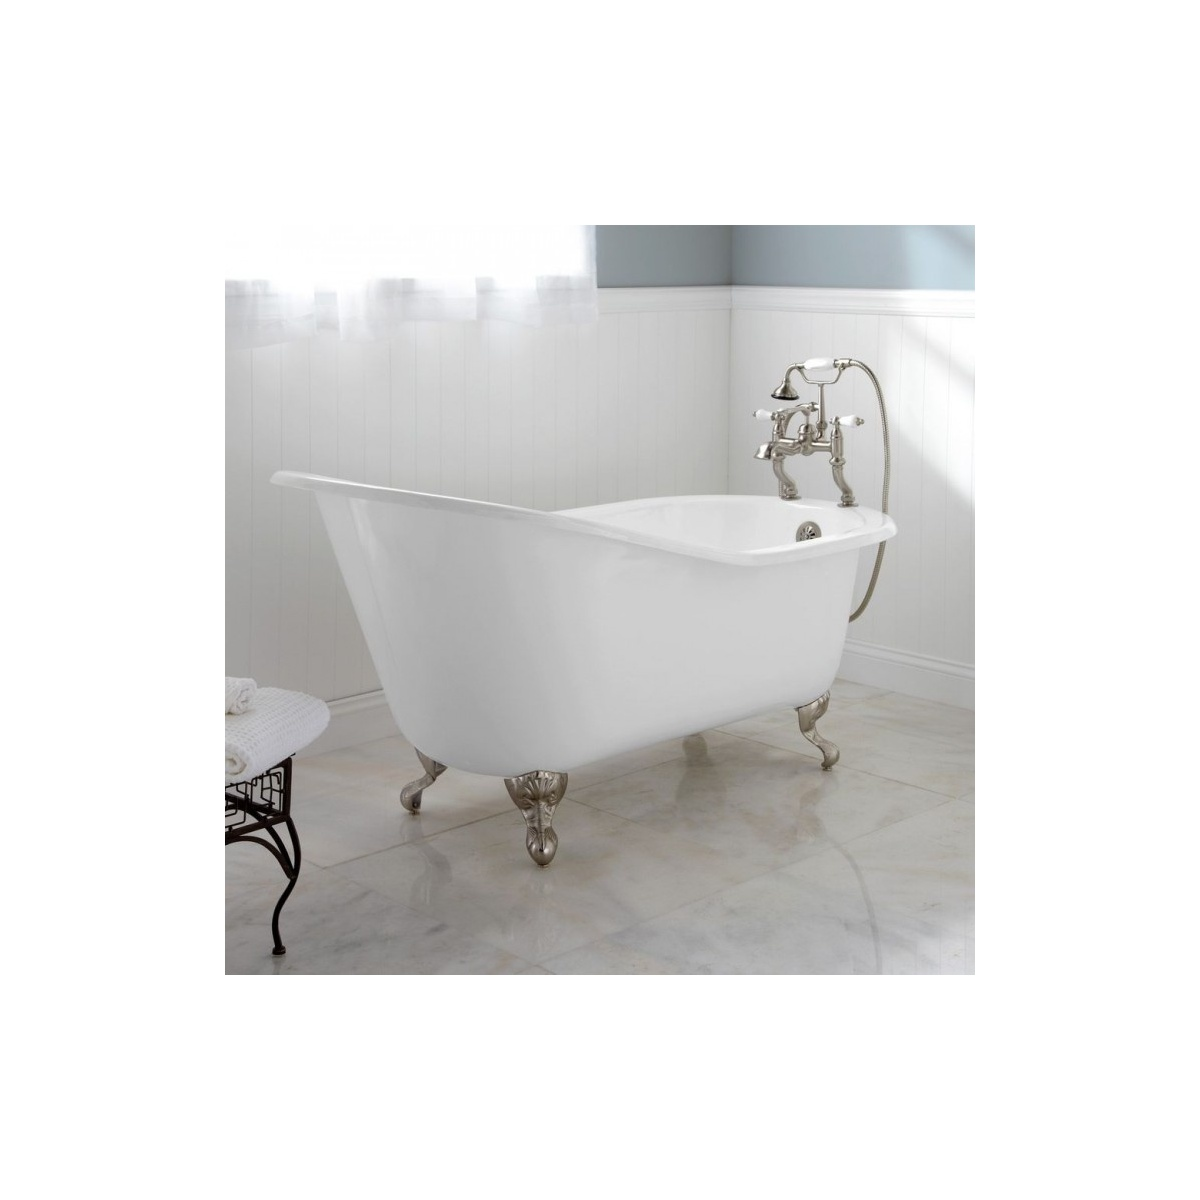 Vasca Da Bagno Classica In Ghisa Colore Bianco Freestanding Simas